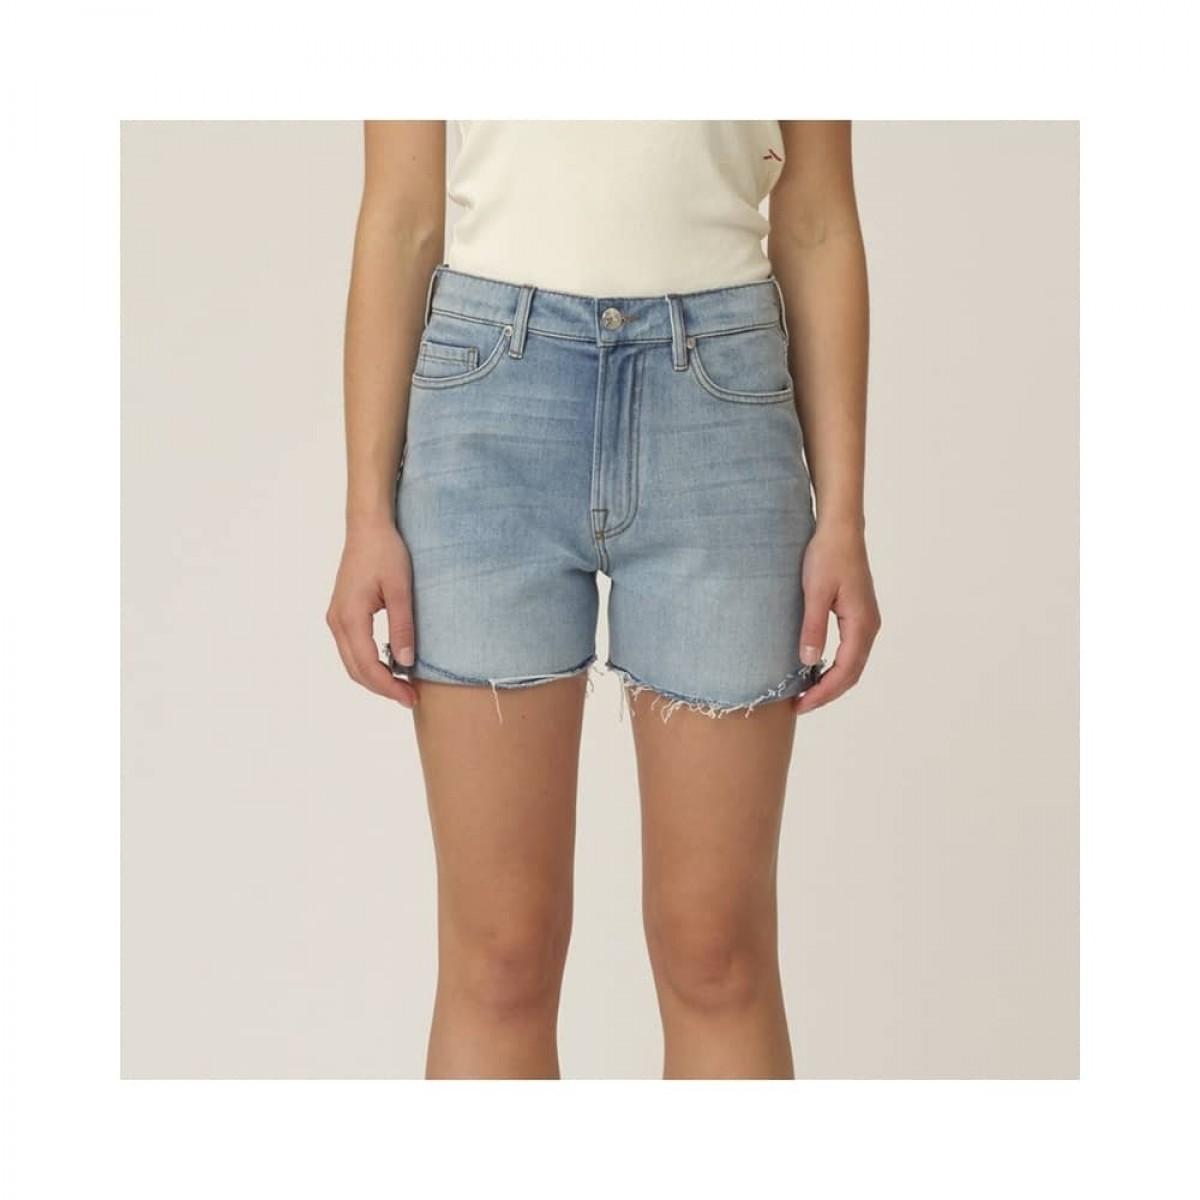 brown straight shorts - light blue